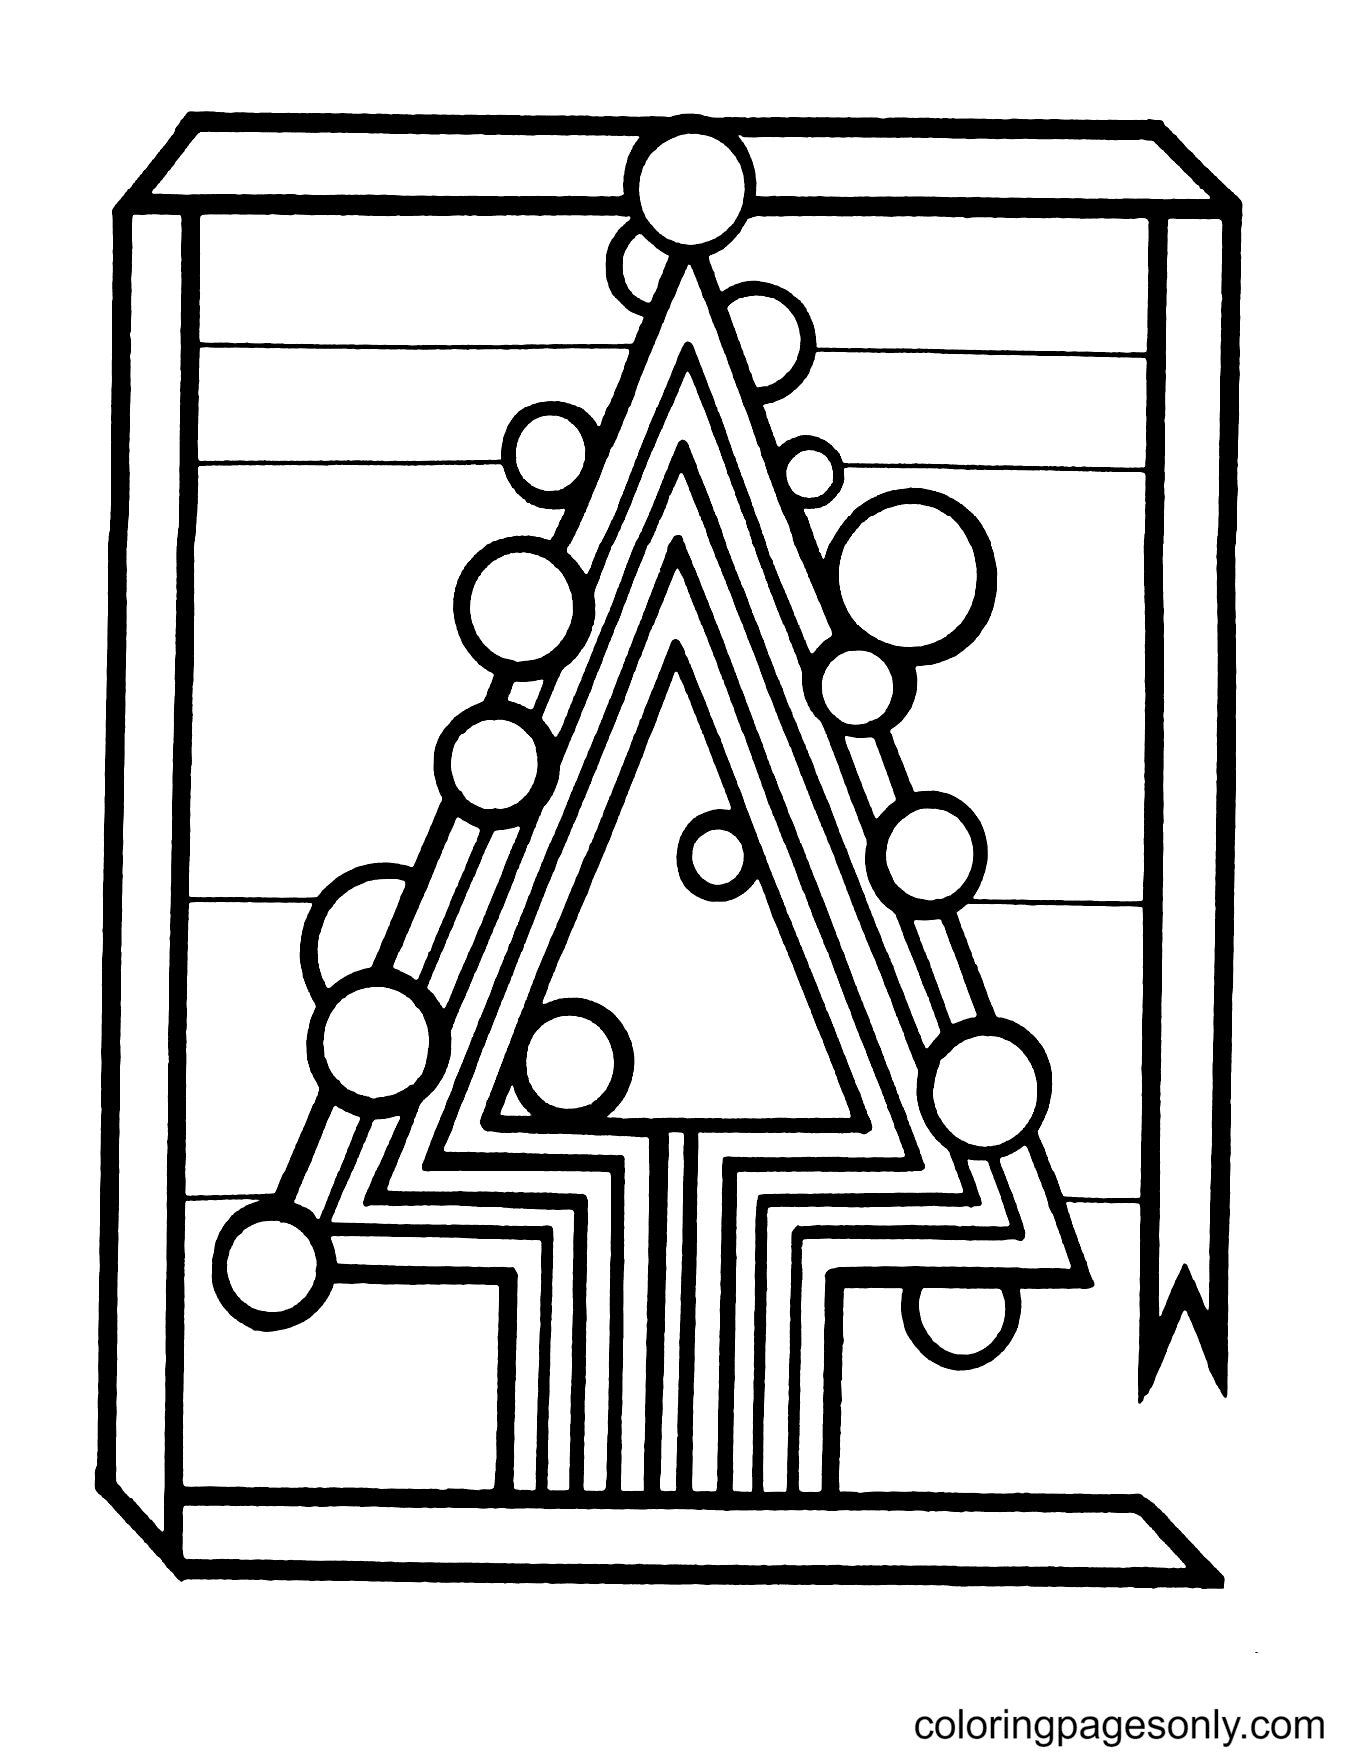 Fun Geometric Style Christmas Tree Coloring Page